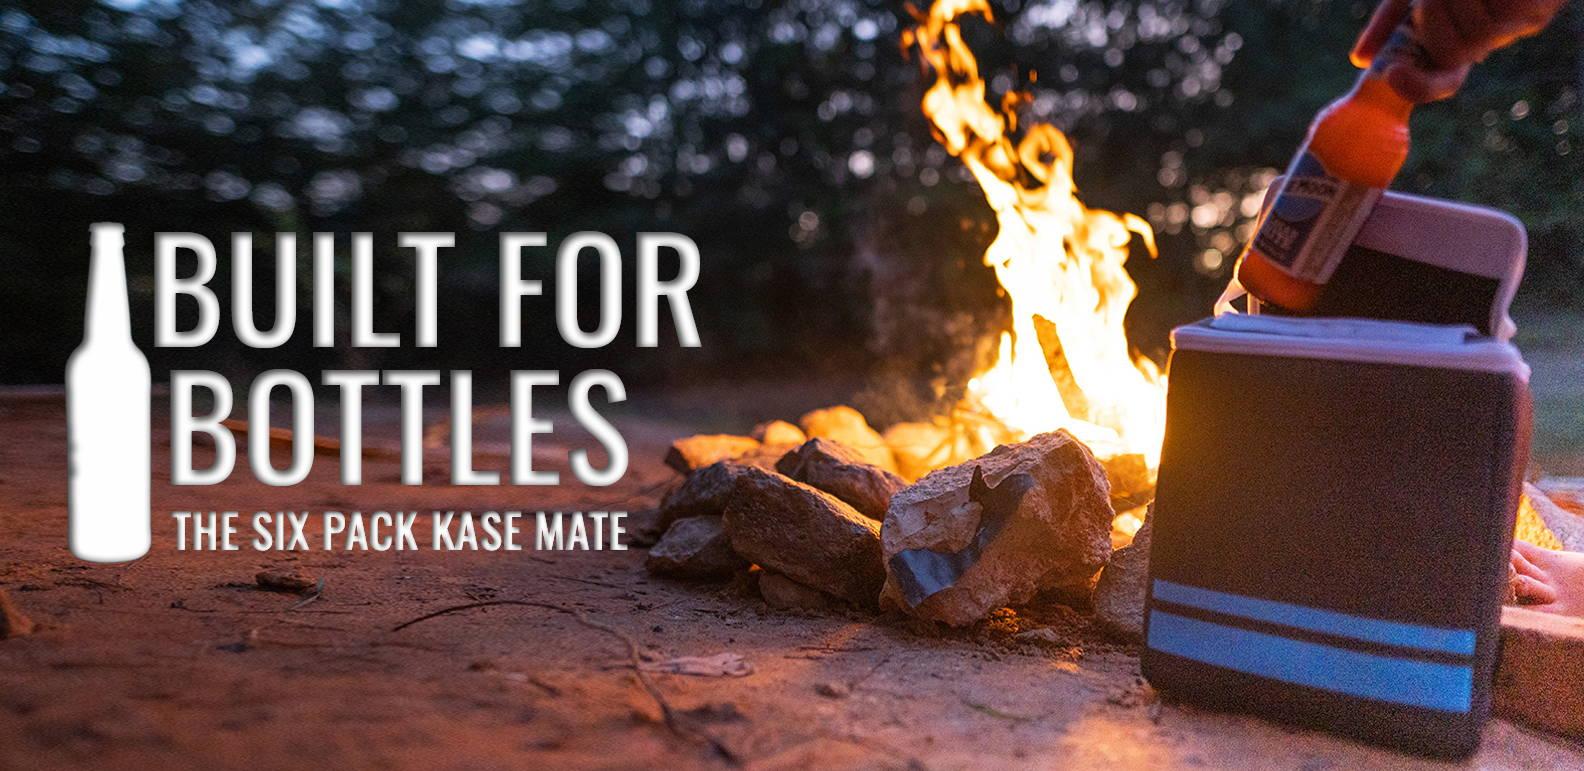 Kanga Kase Mate Esky Six Pack Around The Fire.